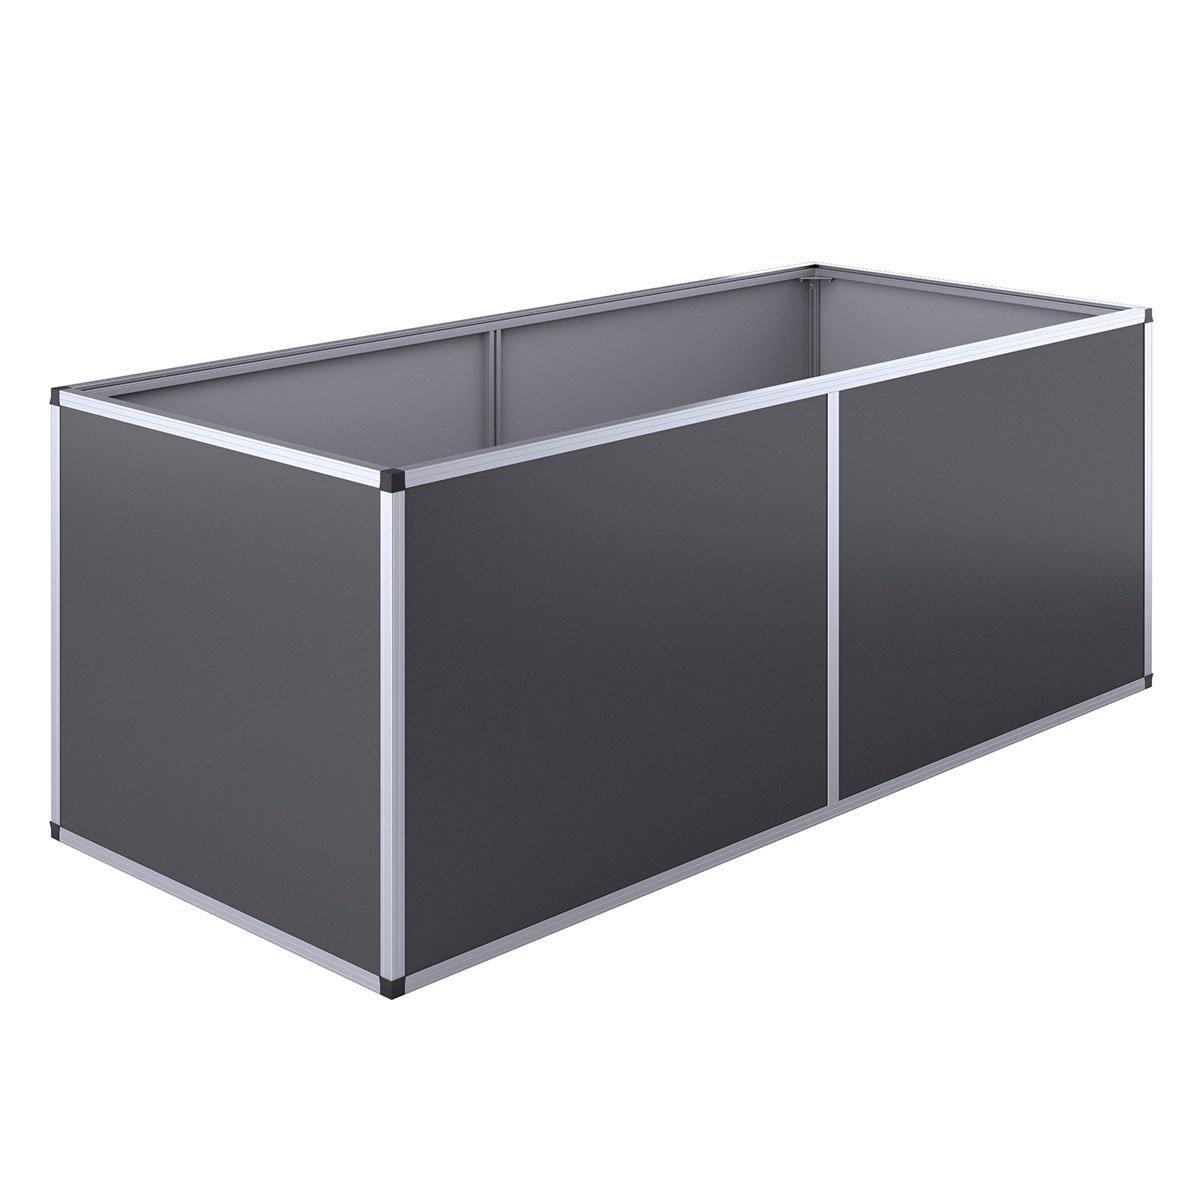 Aluminium-Hochbeet 210, anthrazit /silber, 205x91x77 cm   #2